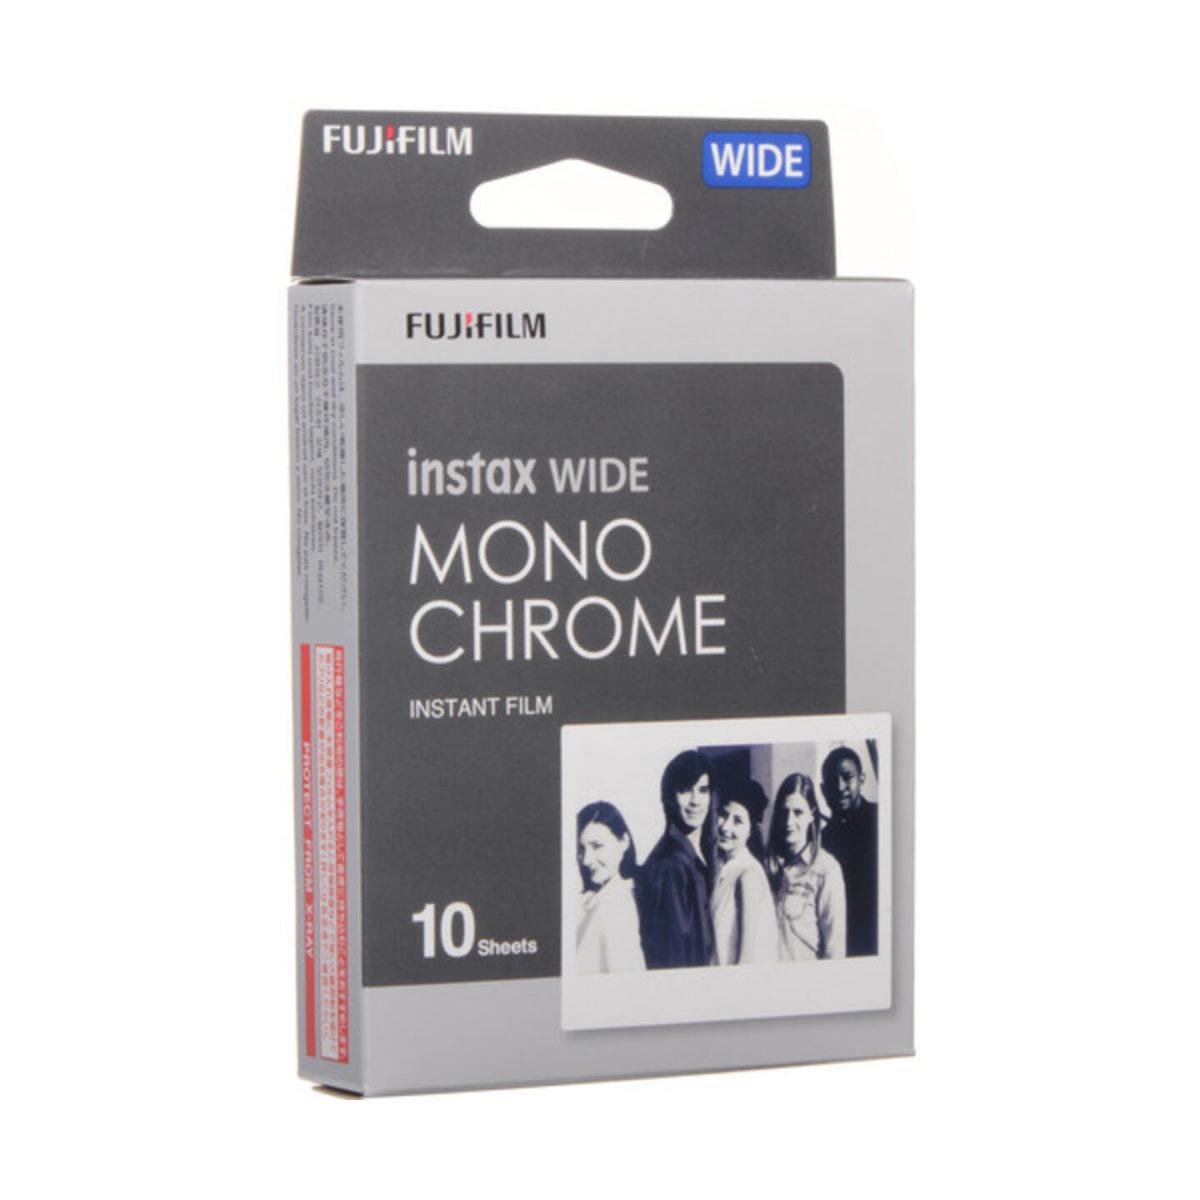 fujifilm_instax_wide_sofortbildfilm_monochrome_10_aufnahmen_01